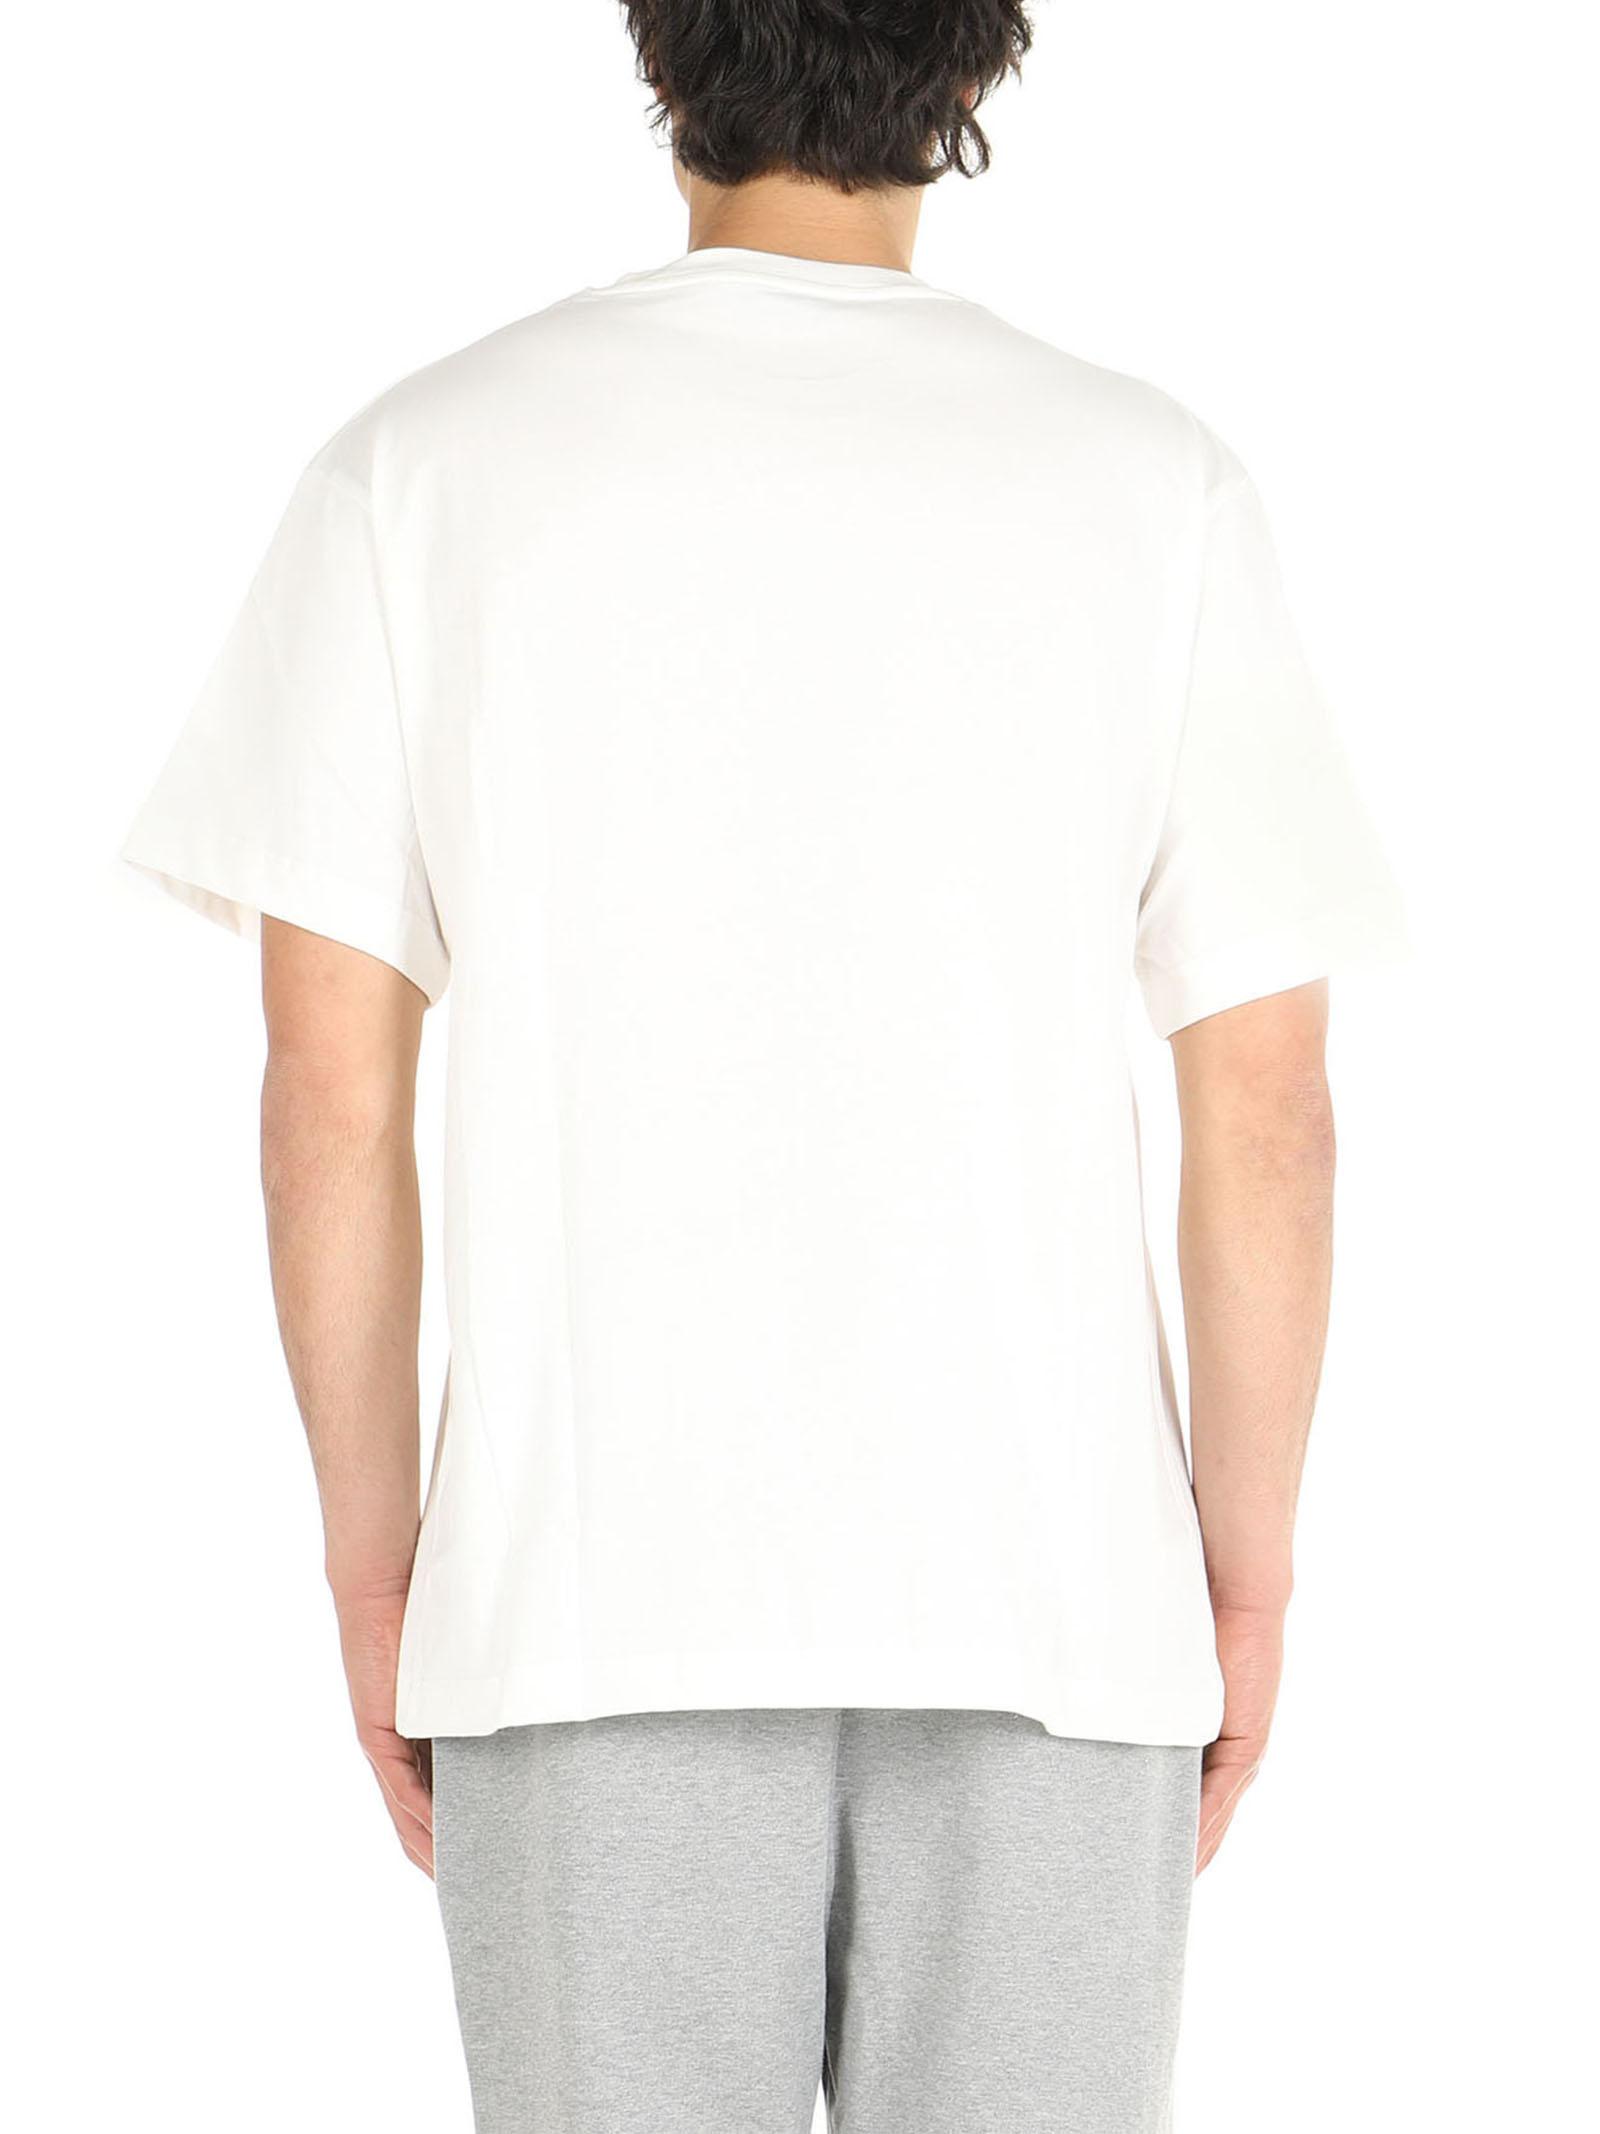 T-Shirt oversize De Lamp | T-Shirt | DL21 08167BIANCO